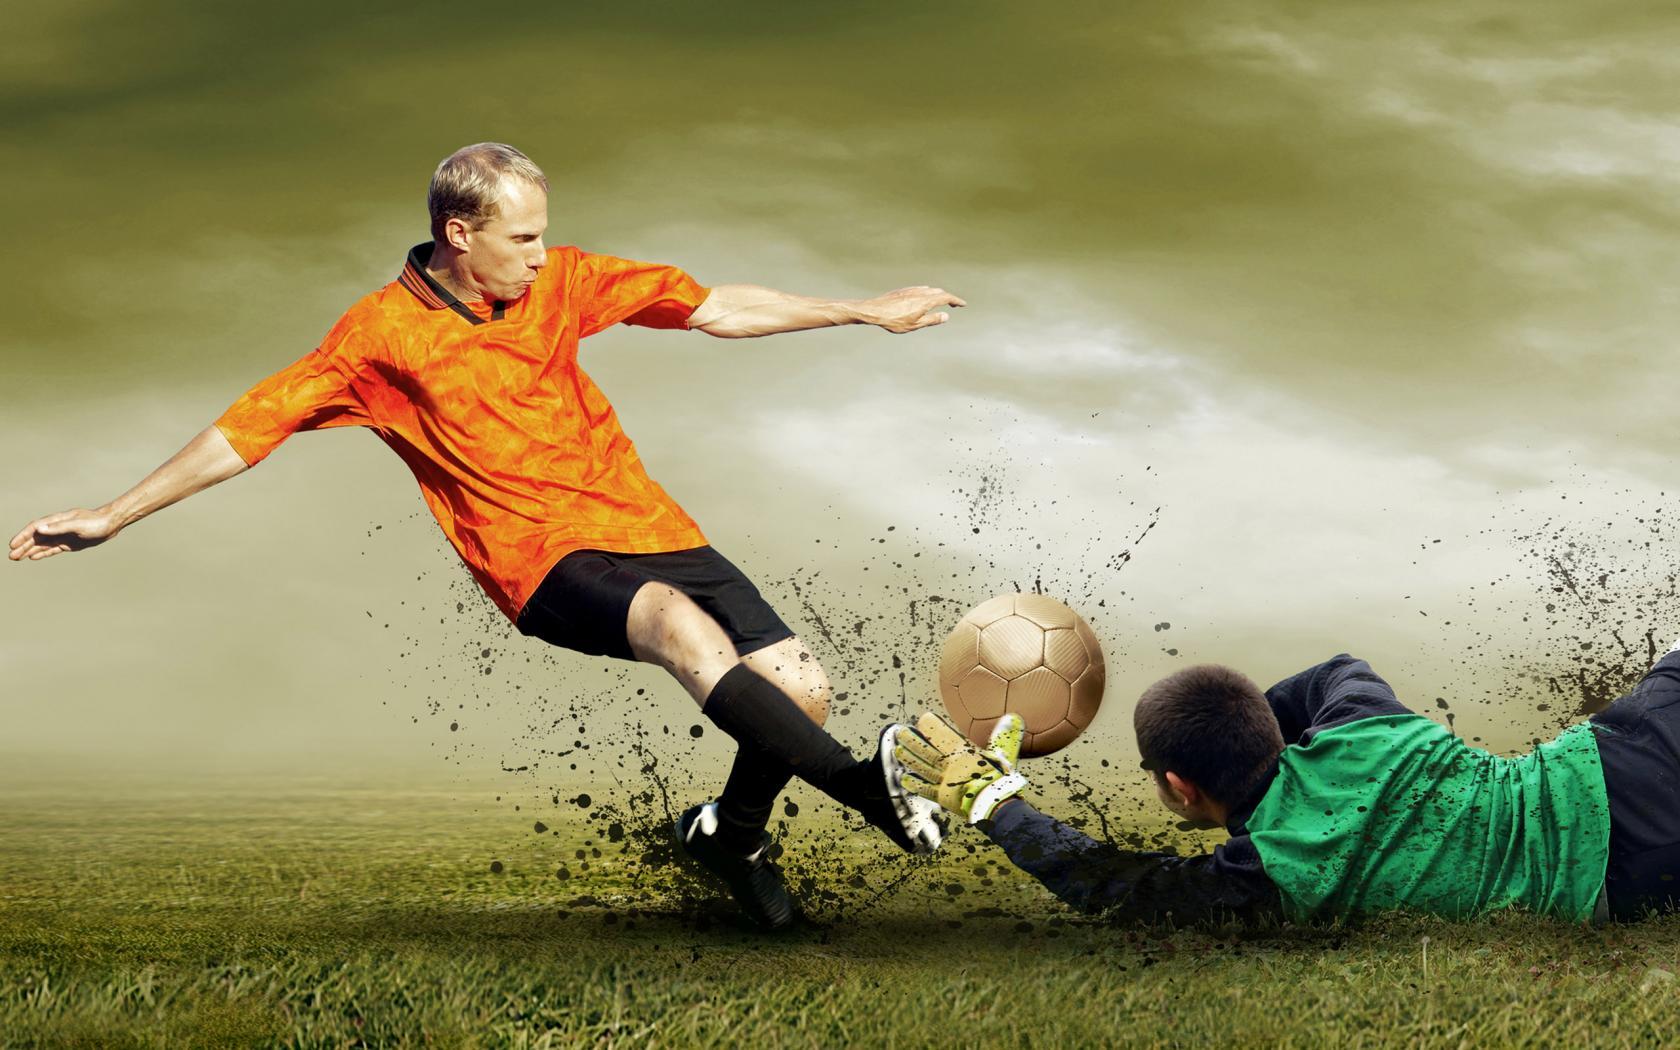 10 м 01 реал футбол ипрогнозы ставки лудогорец 2018г